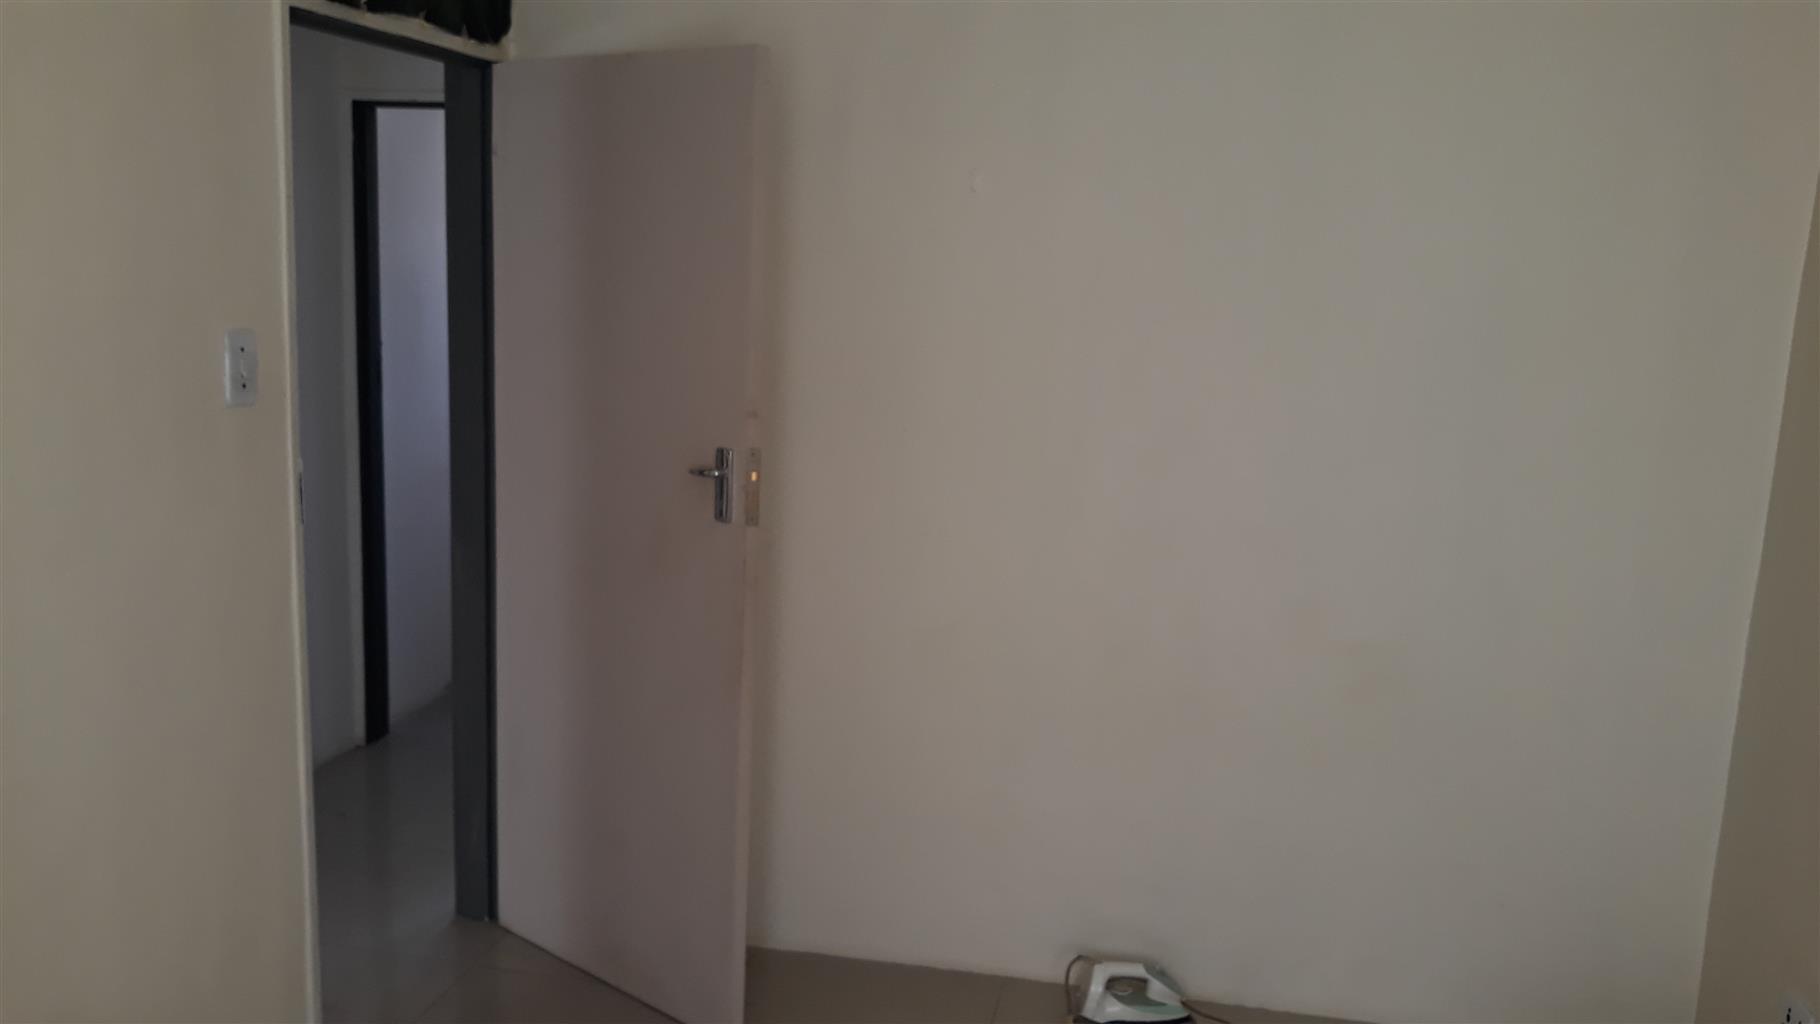 Complete Neat 3 bedroom house for Rent in Rydalvale, Phoenix